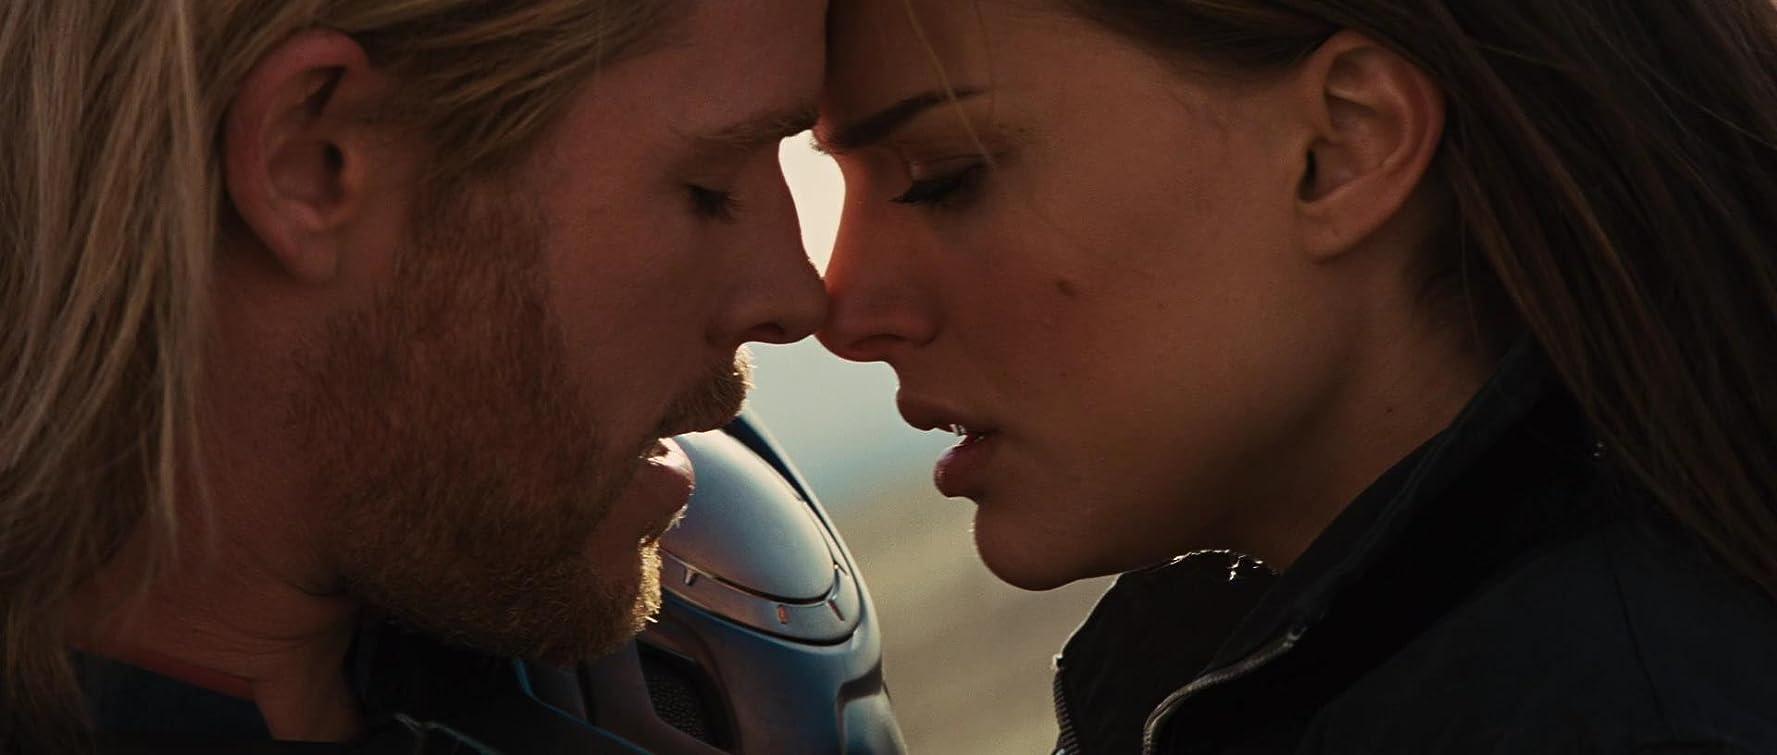 Natalie Portman and Chris Hemsworth in Thor (2011)